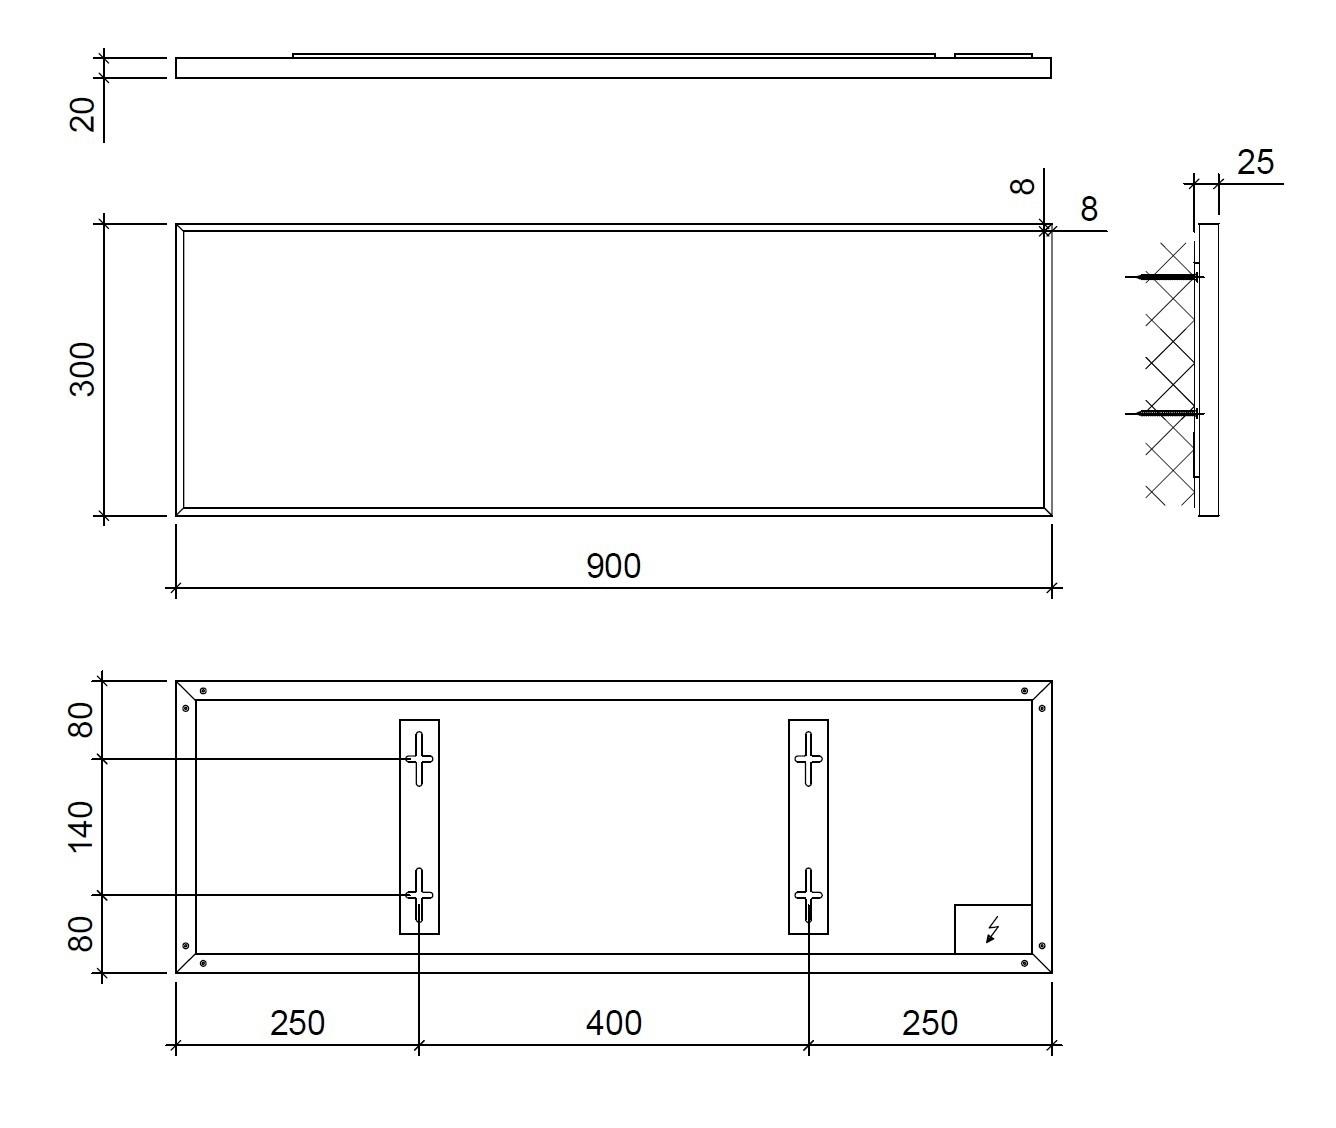 heizk rper infrarot mit bild bildmotiv oder wunschbild. Black Bedroom Furniture Sets. Home Design Ideas